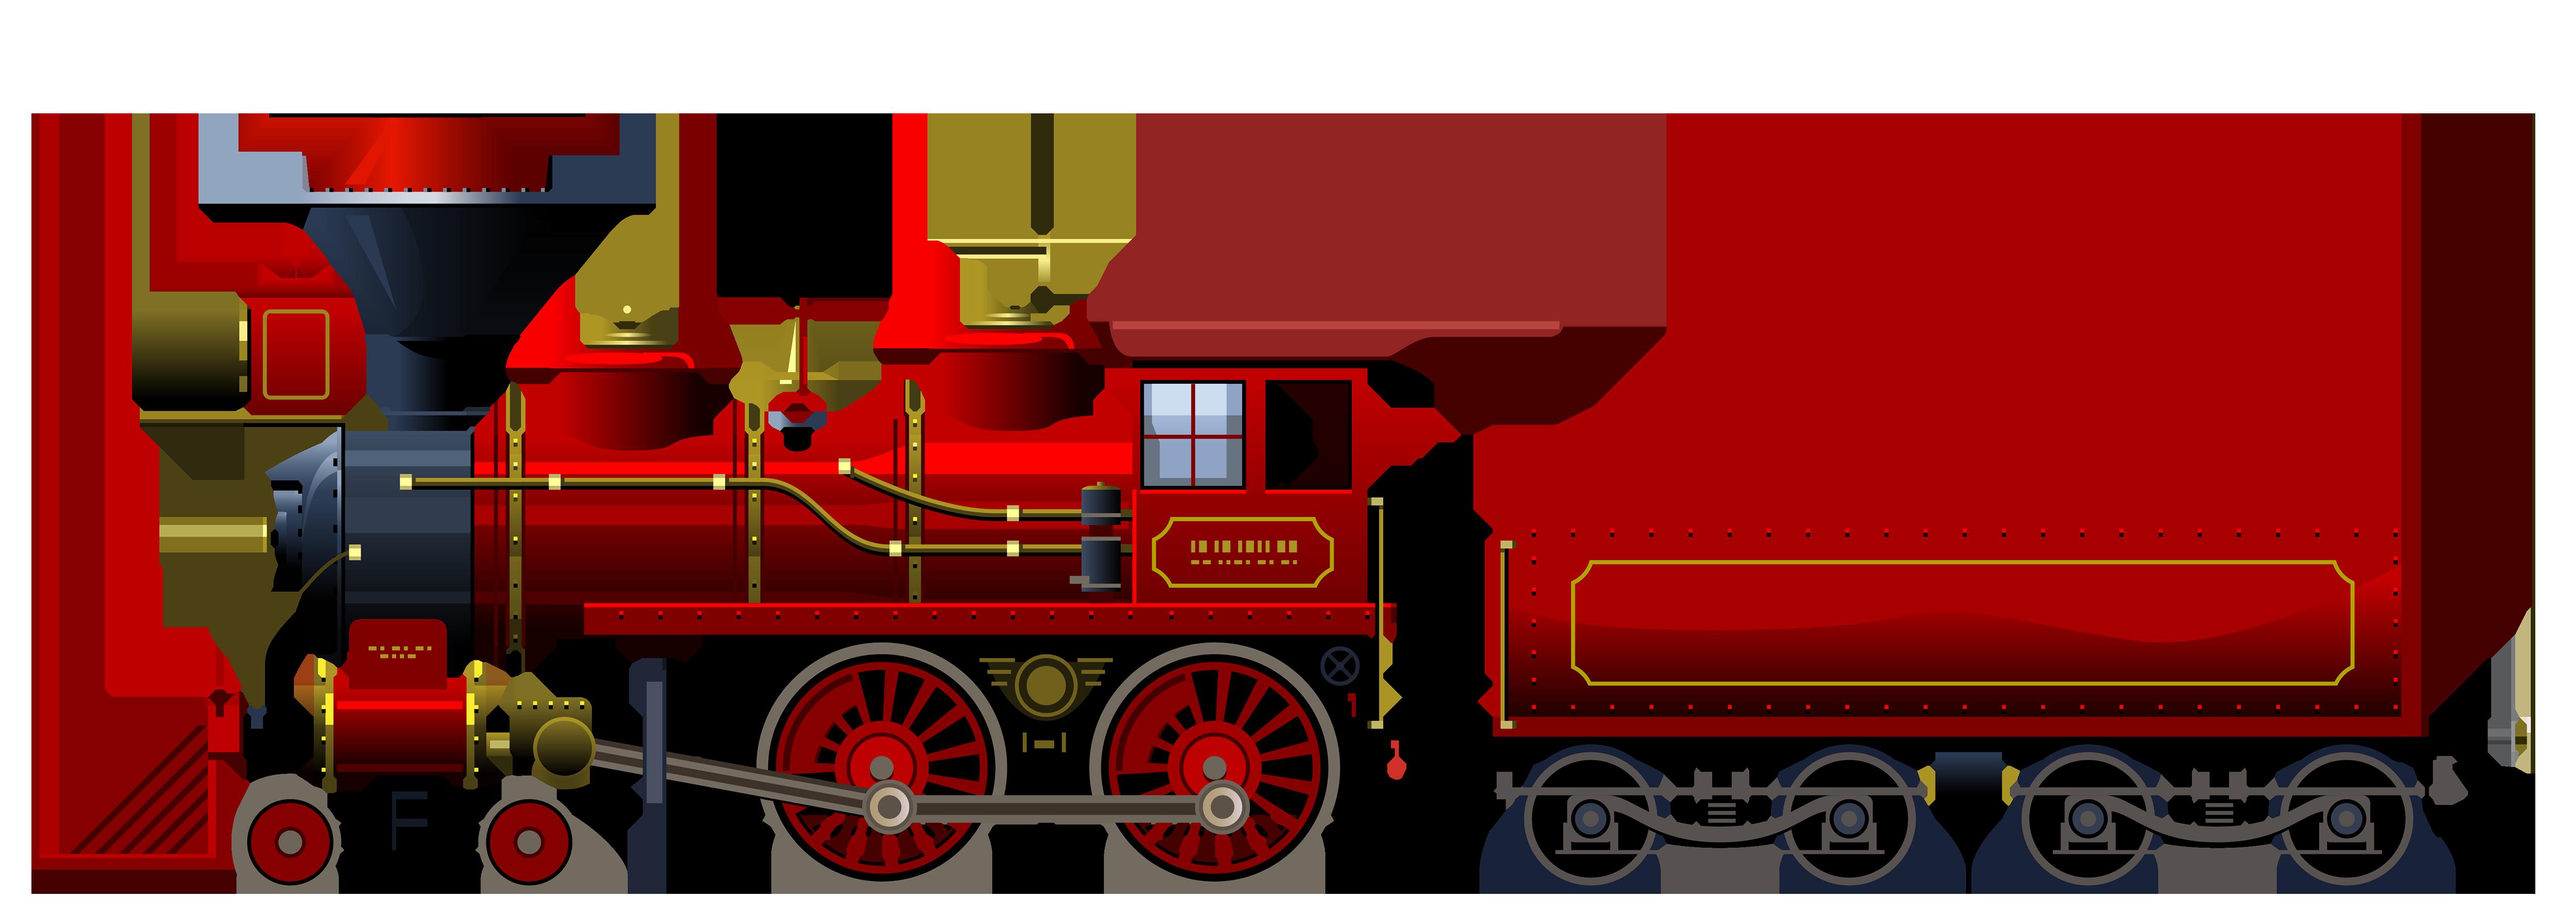 Transportation clipart name. Red locomotive png best